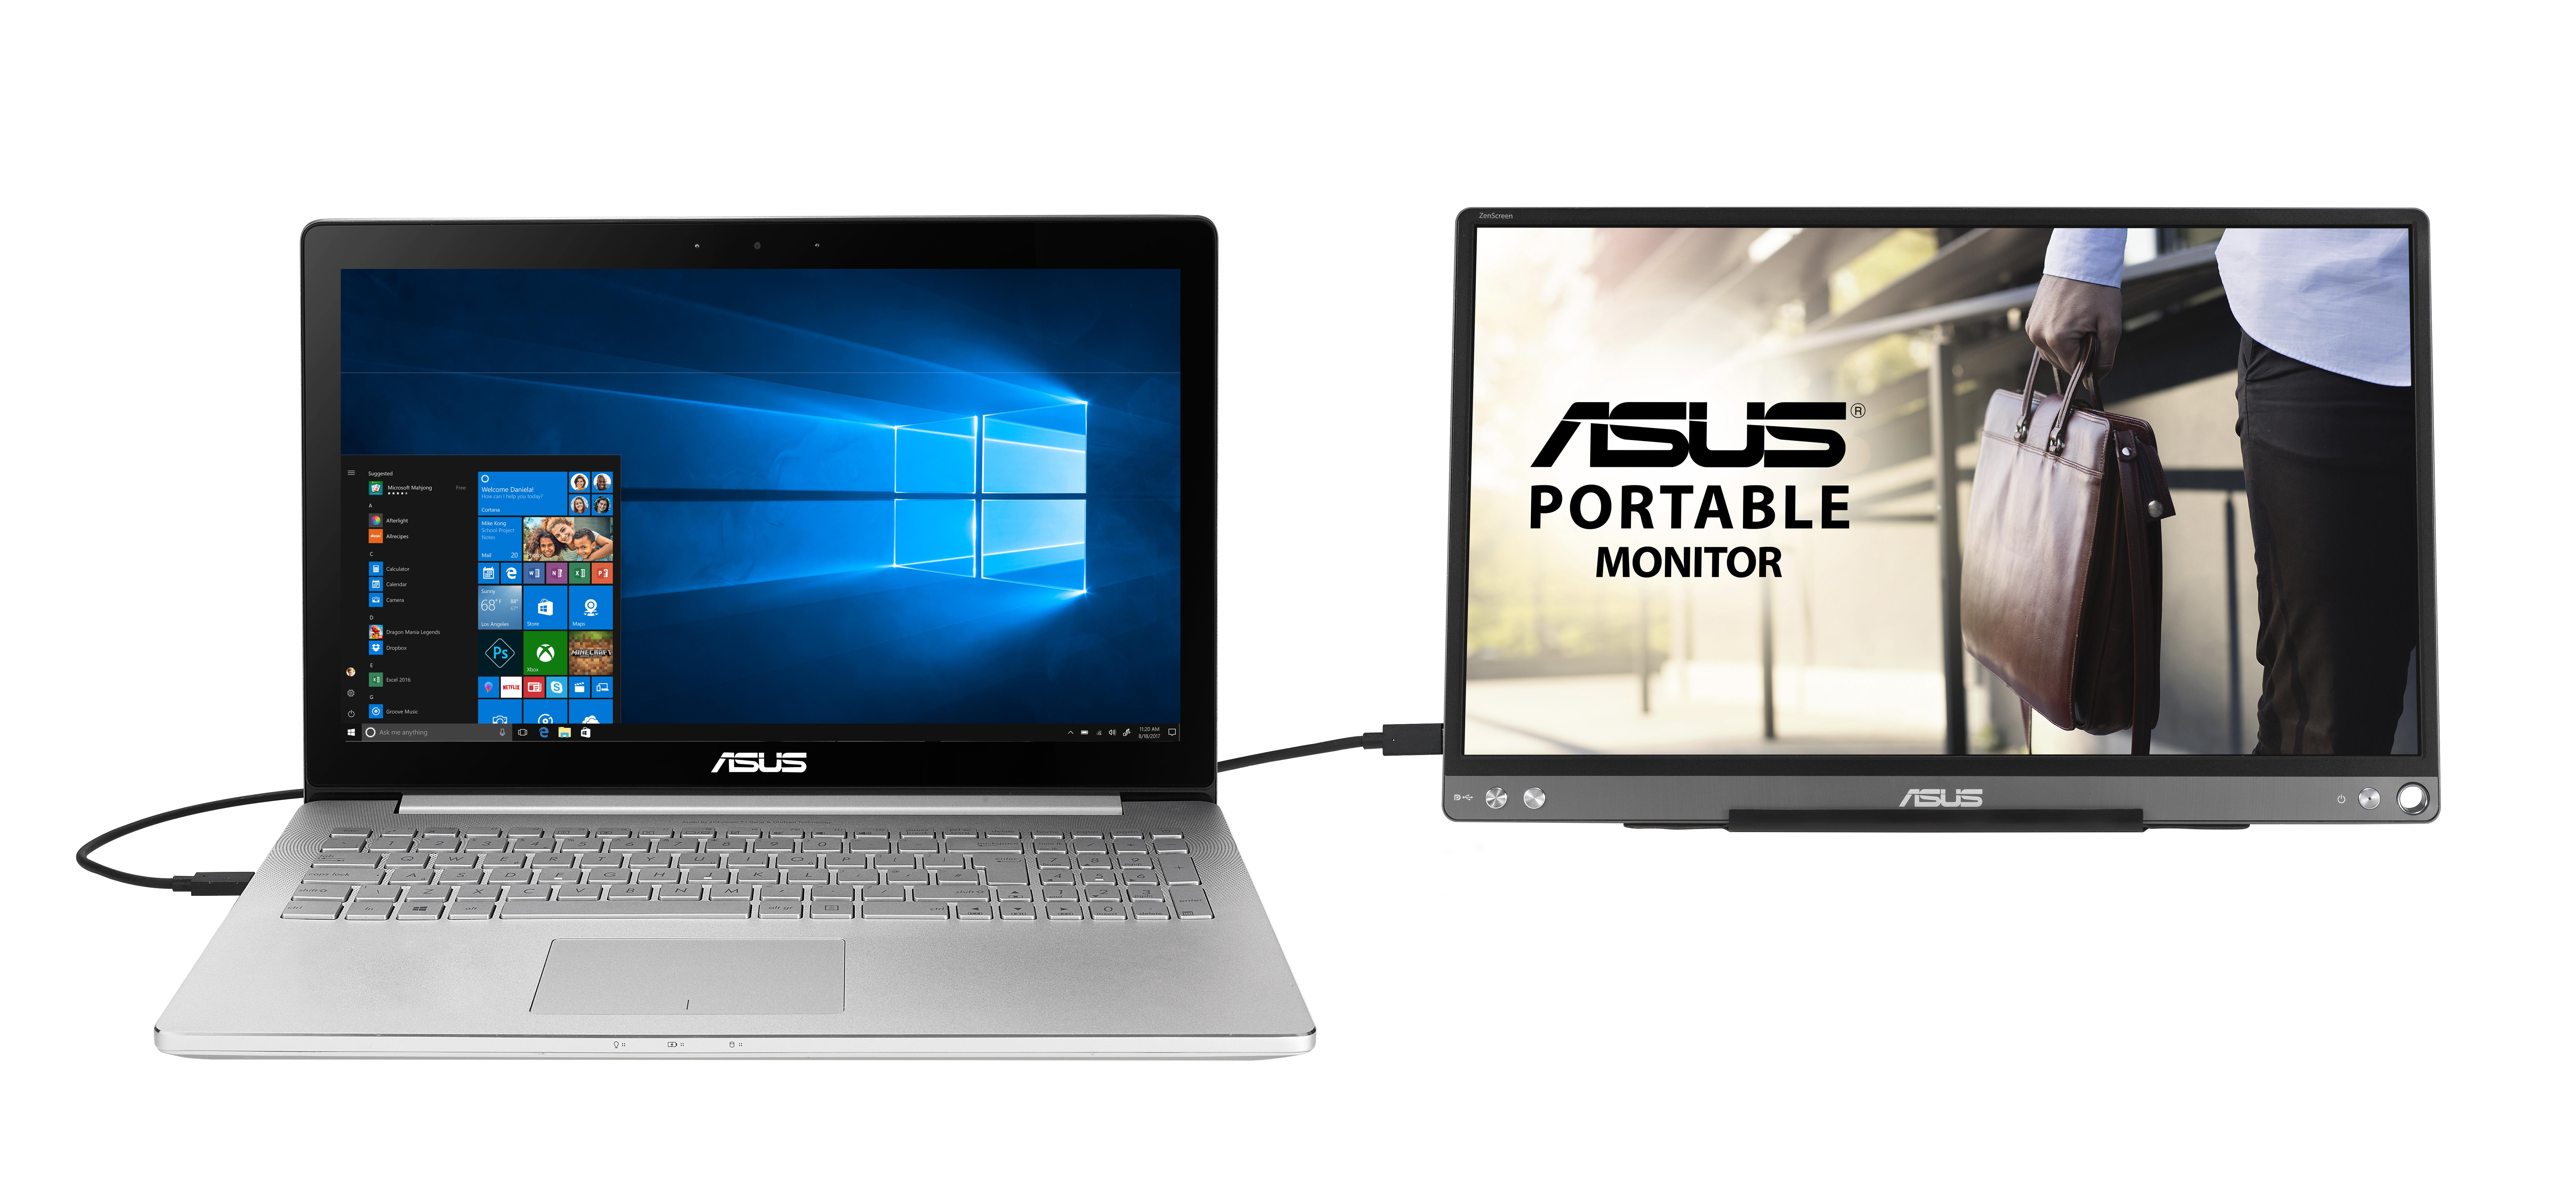 Asus-ZenScreen-Portable-Monitor-MB16ACE-Laptop